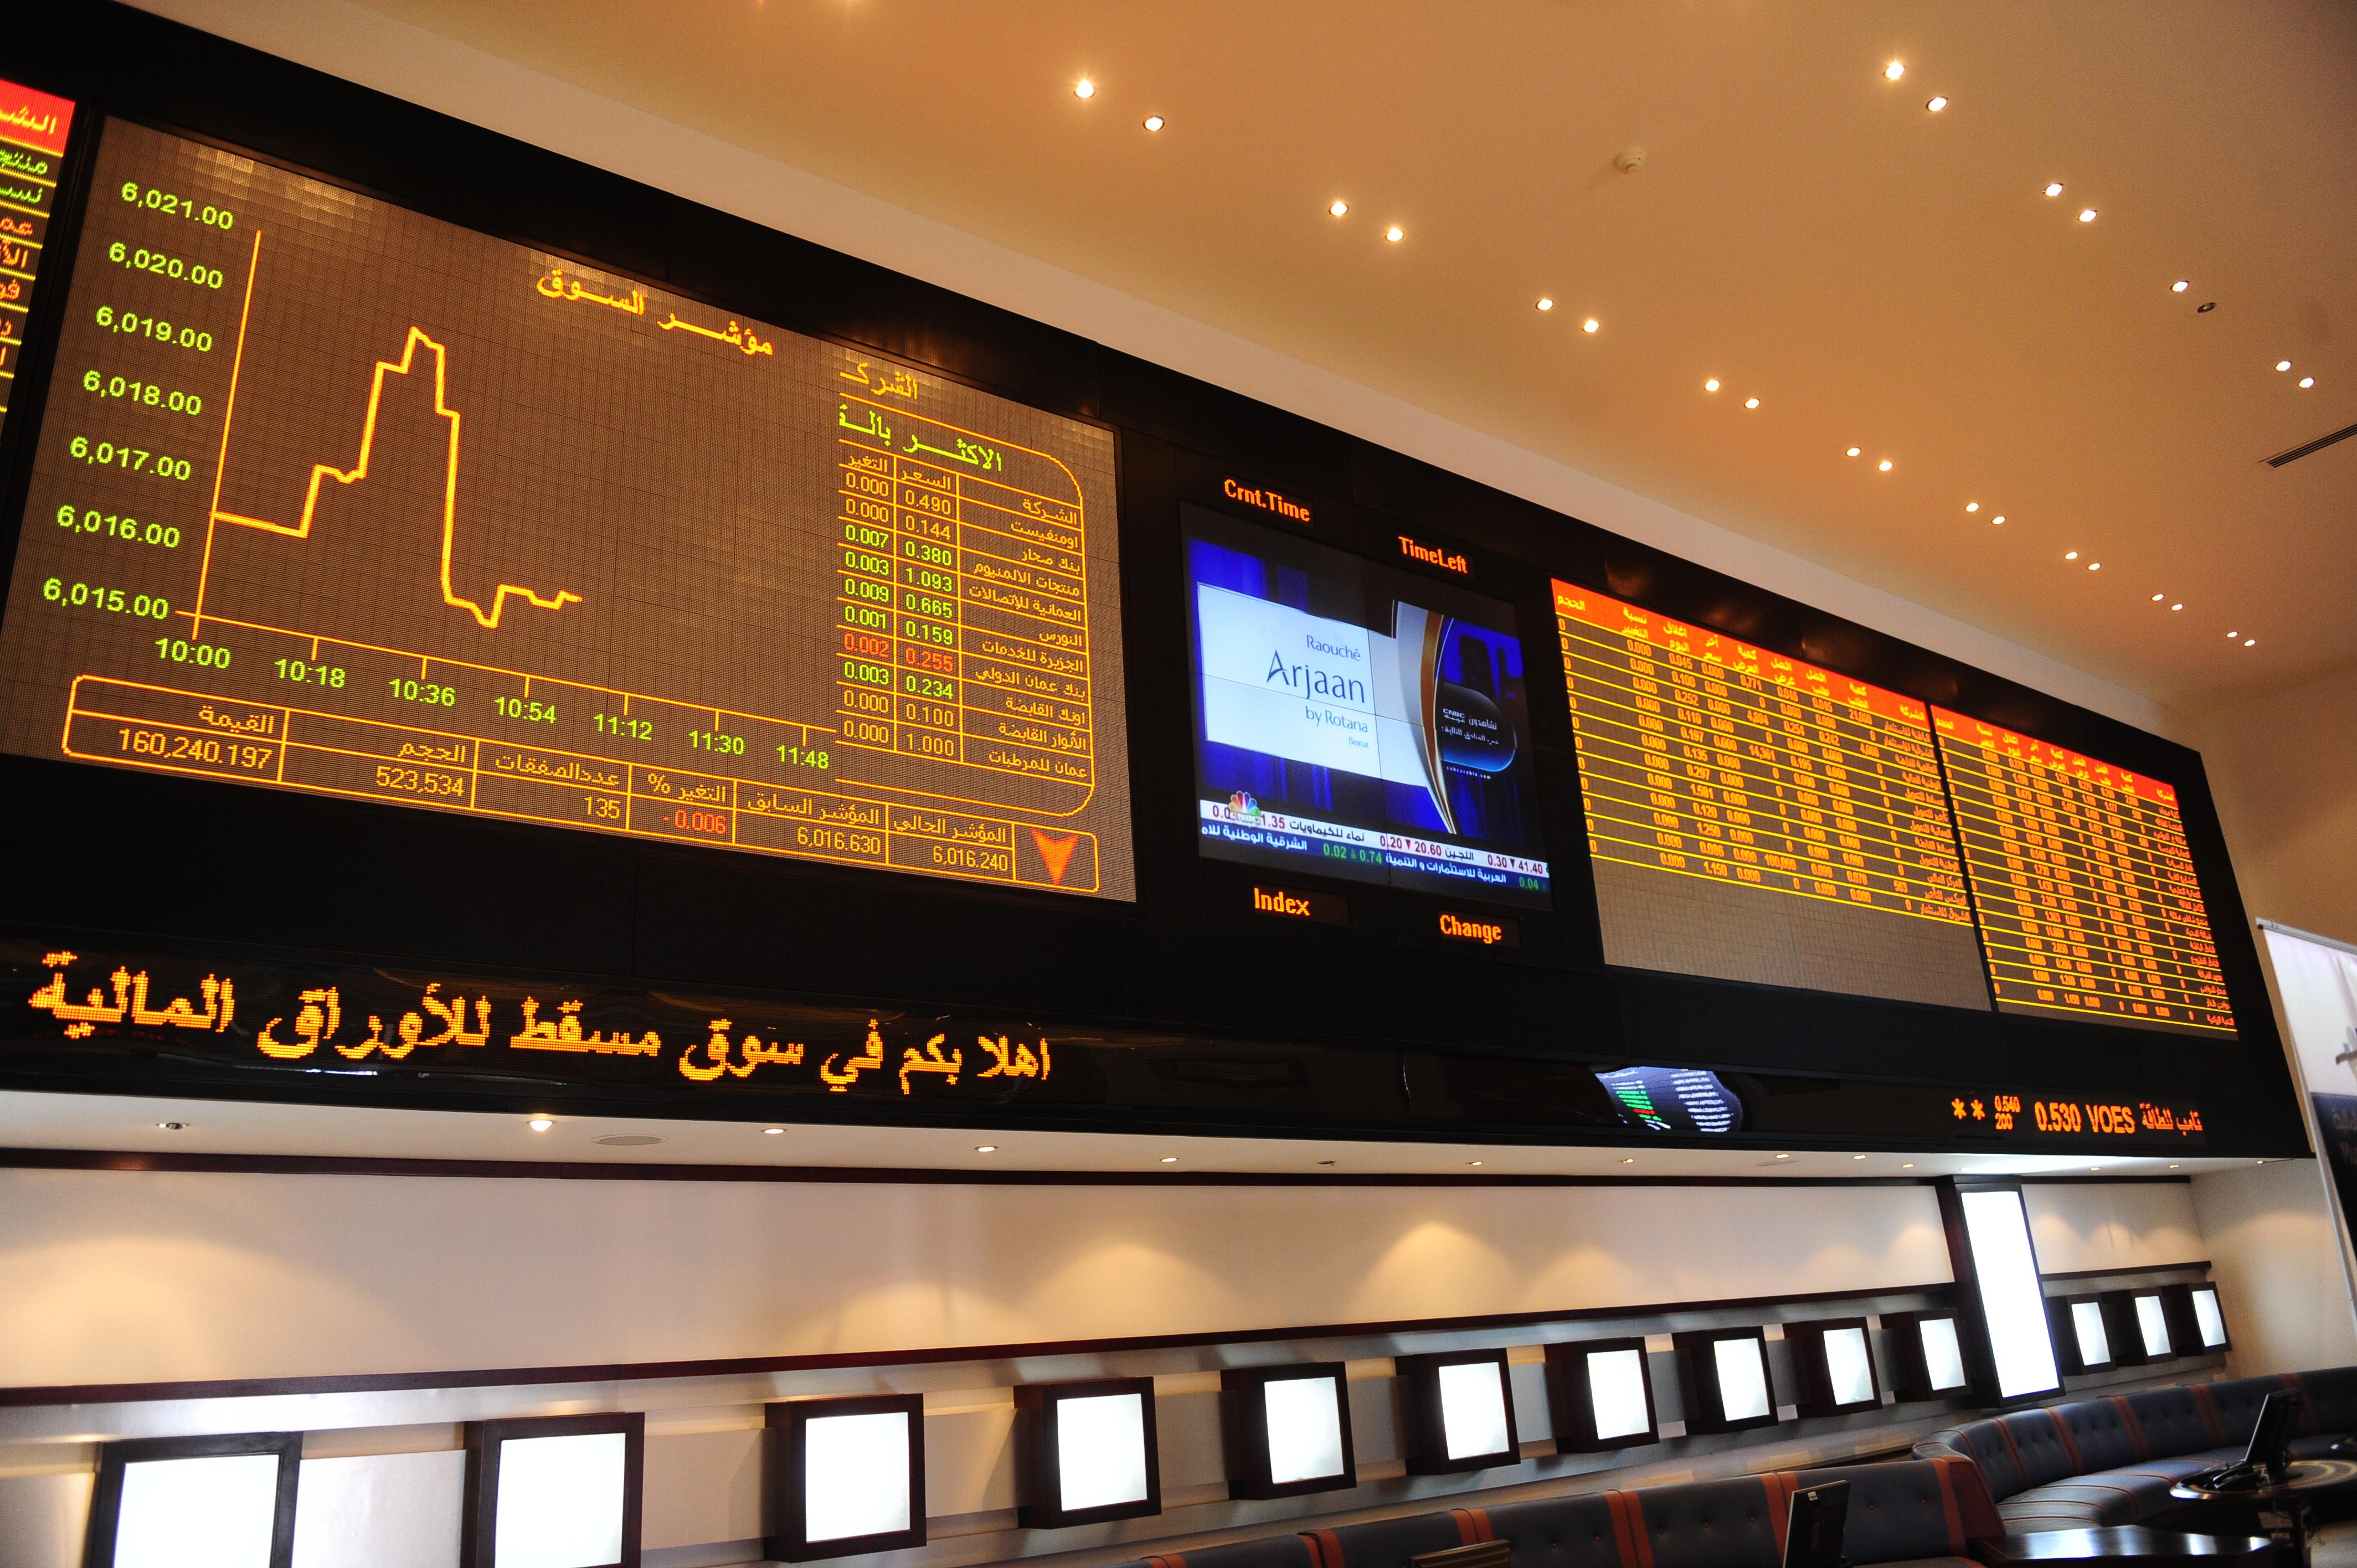 Muscat bourse falls amid thin volumes